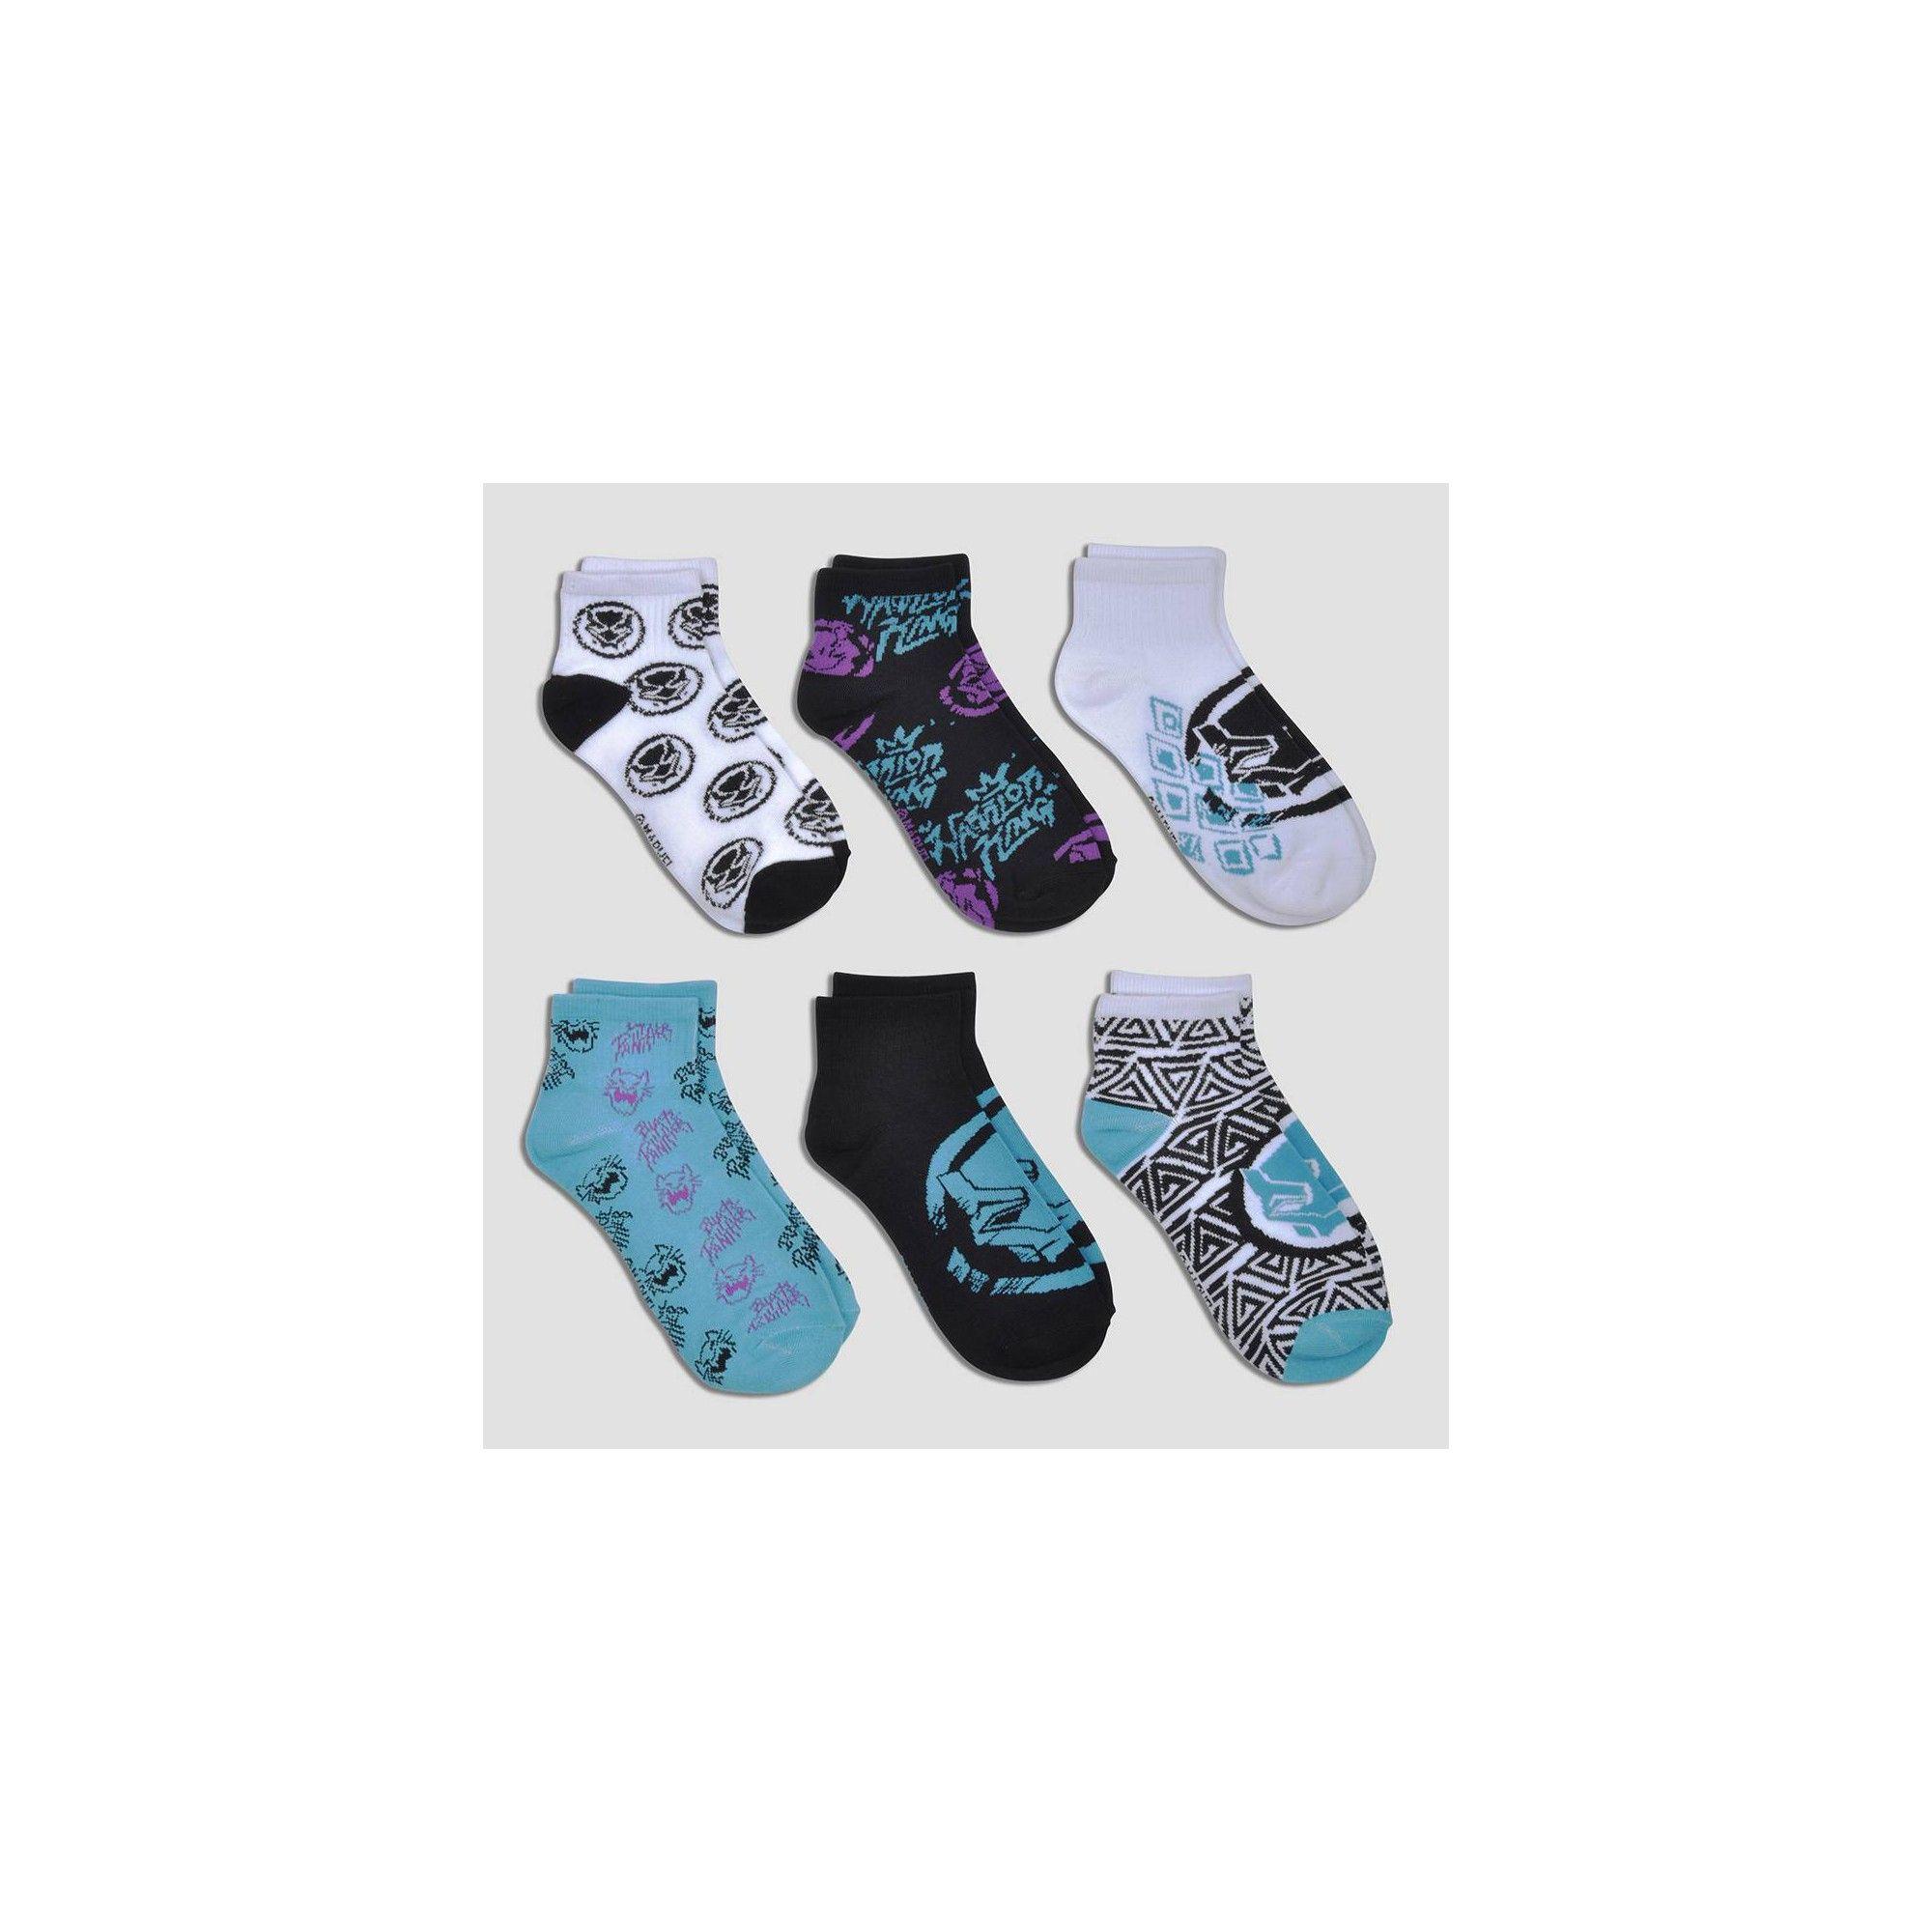 c9da07e4 Kids' Black Panther 6pk No Show Socks - S/M, Kids Unisex, Size ...